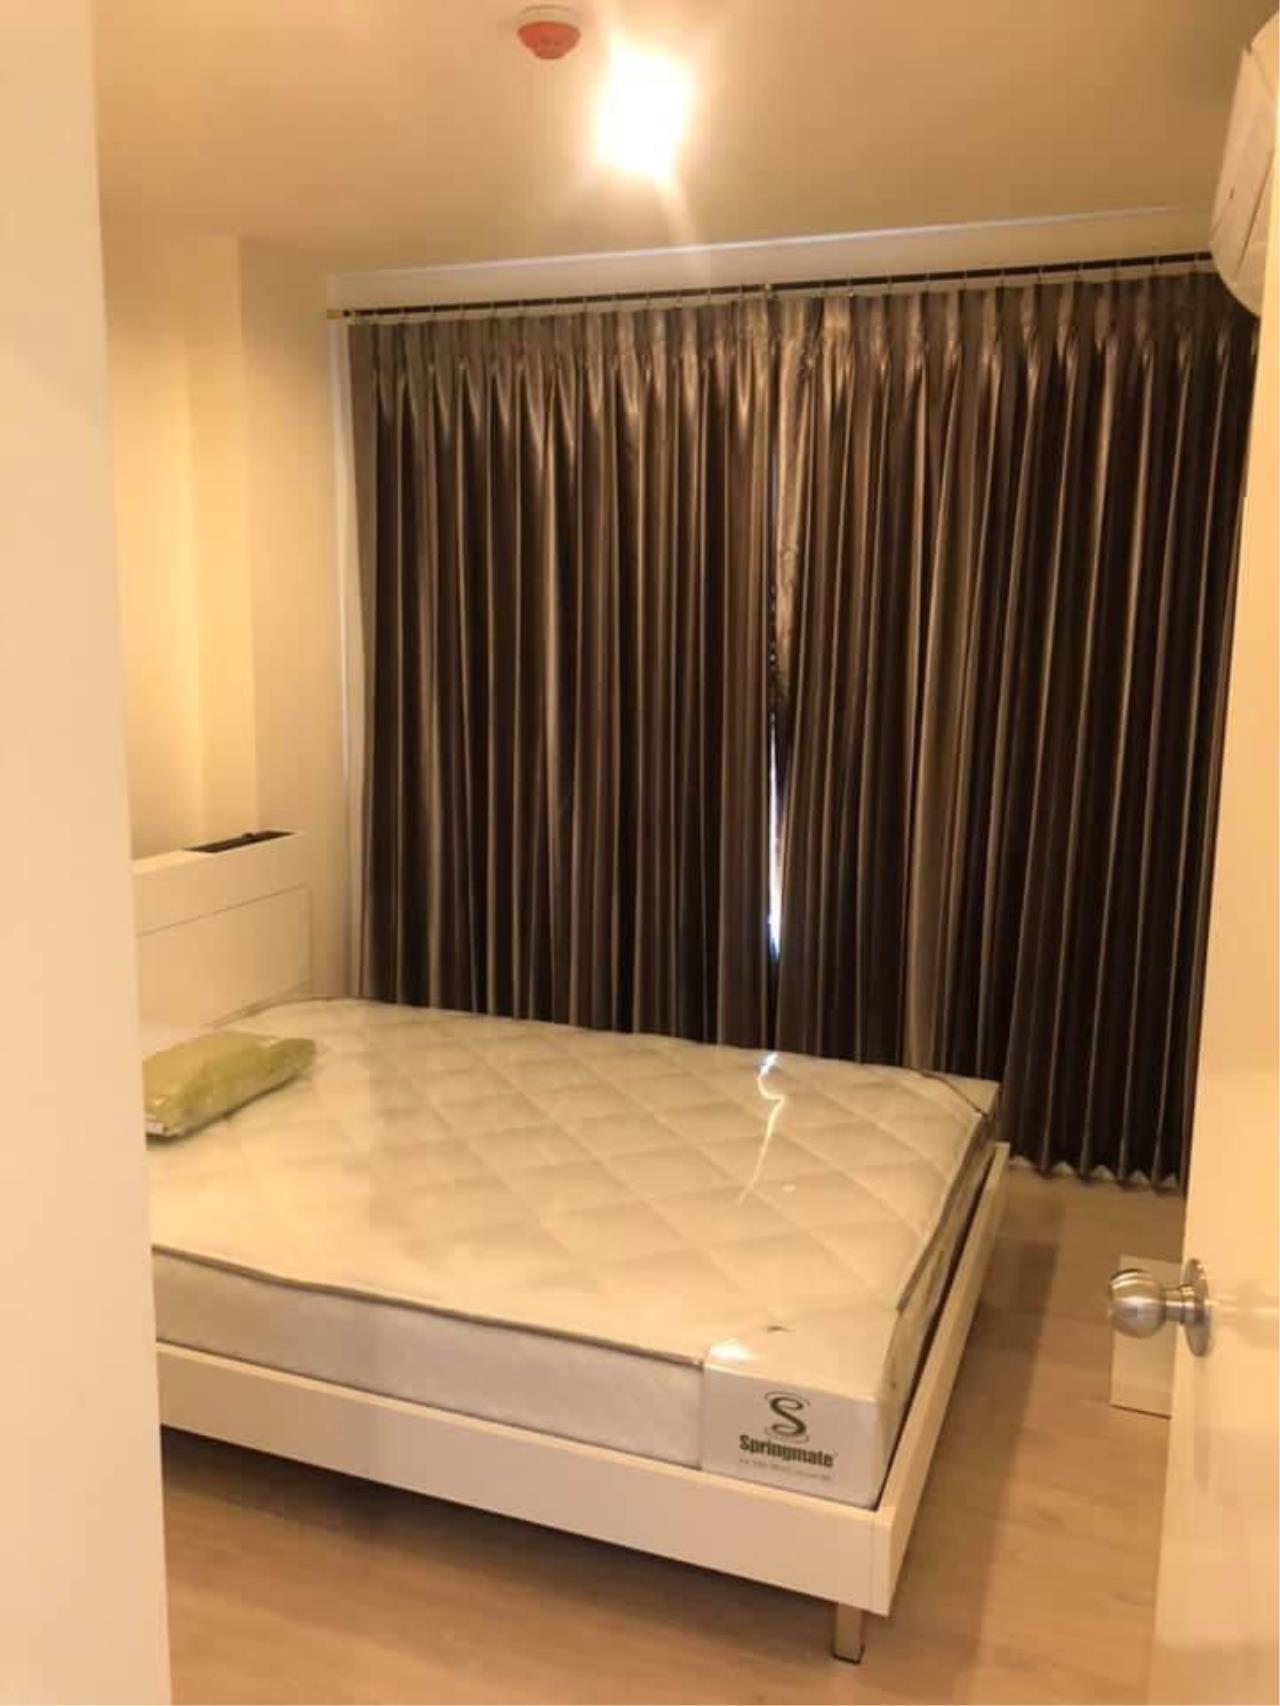 Agent - Phapayawarin Agency's Aspire Sathorn - Thapra for Rent, 1 Bedroom 1 Bathroom, 30.5 Sq.m., BTS Talat Phlu 4